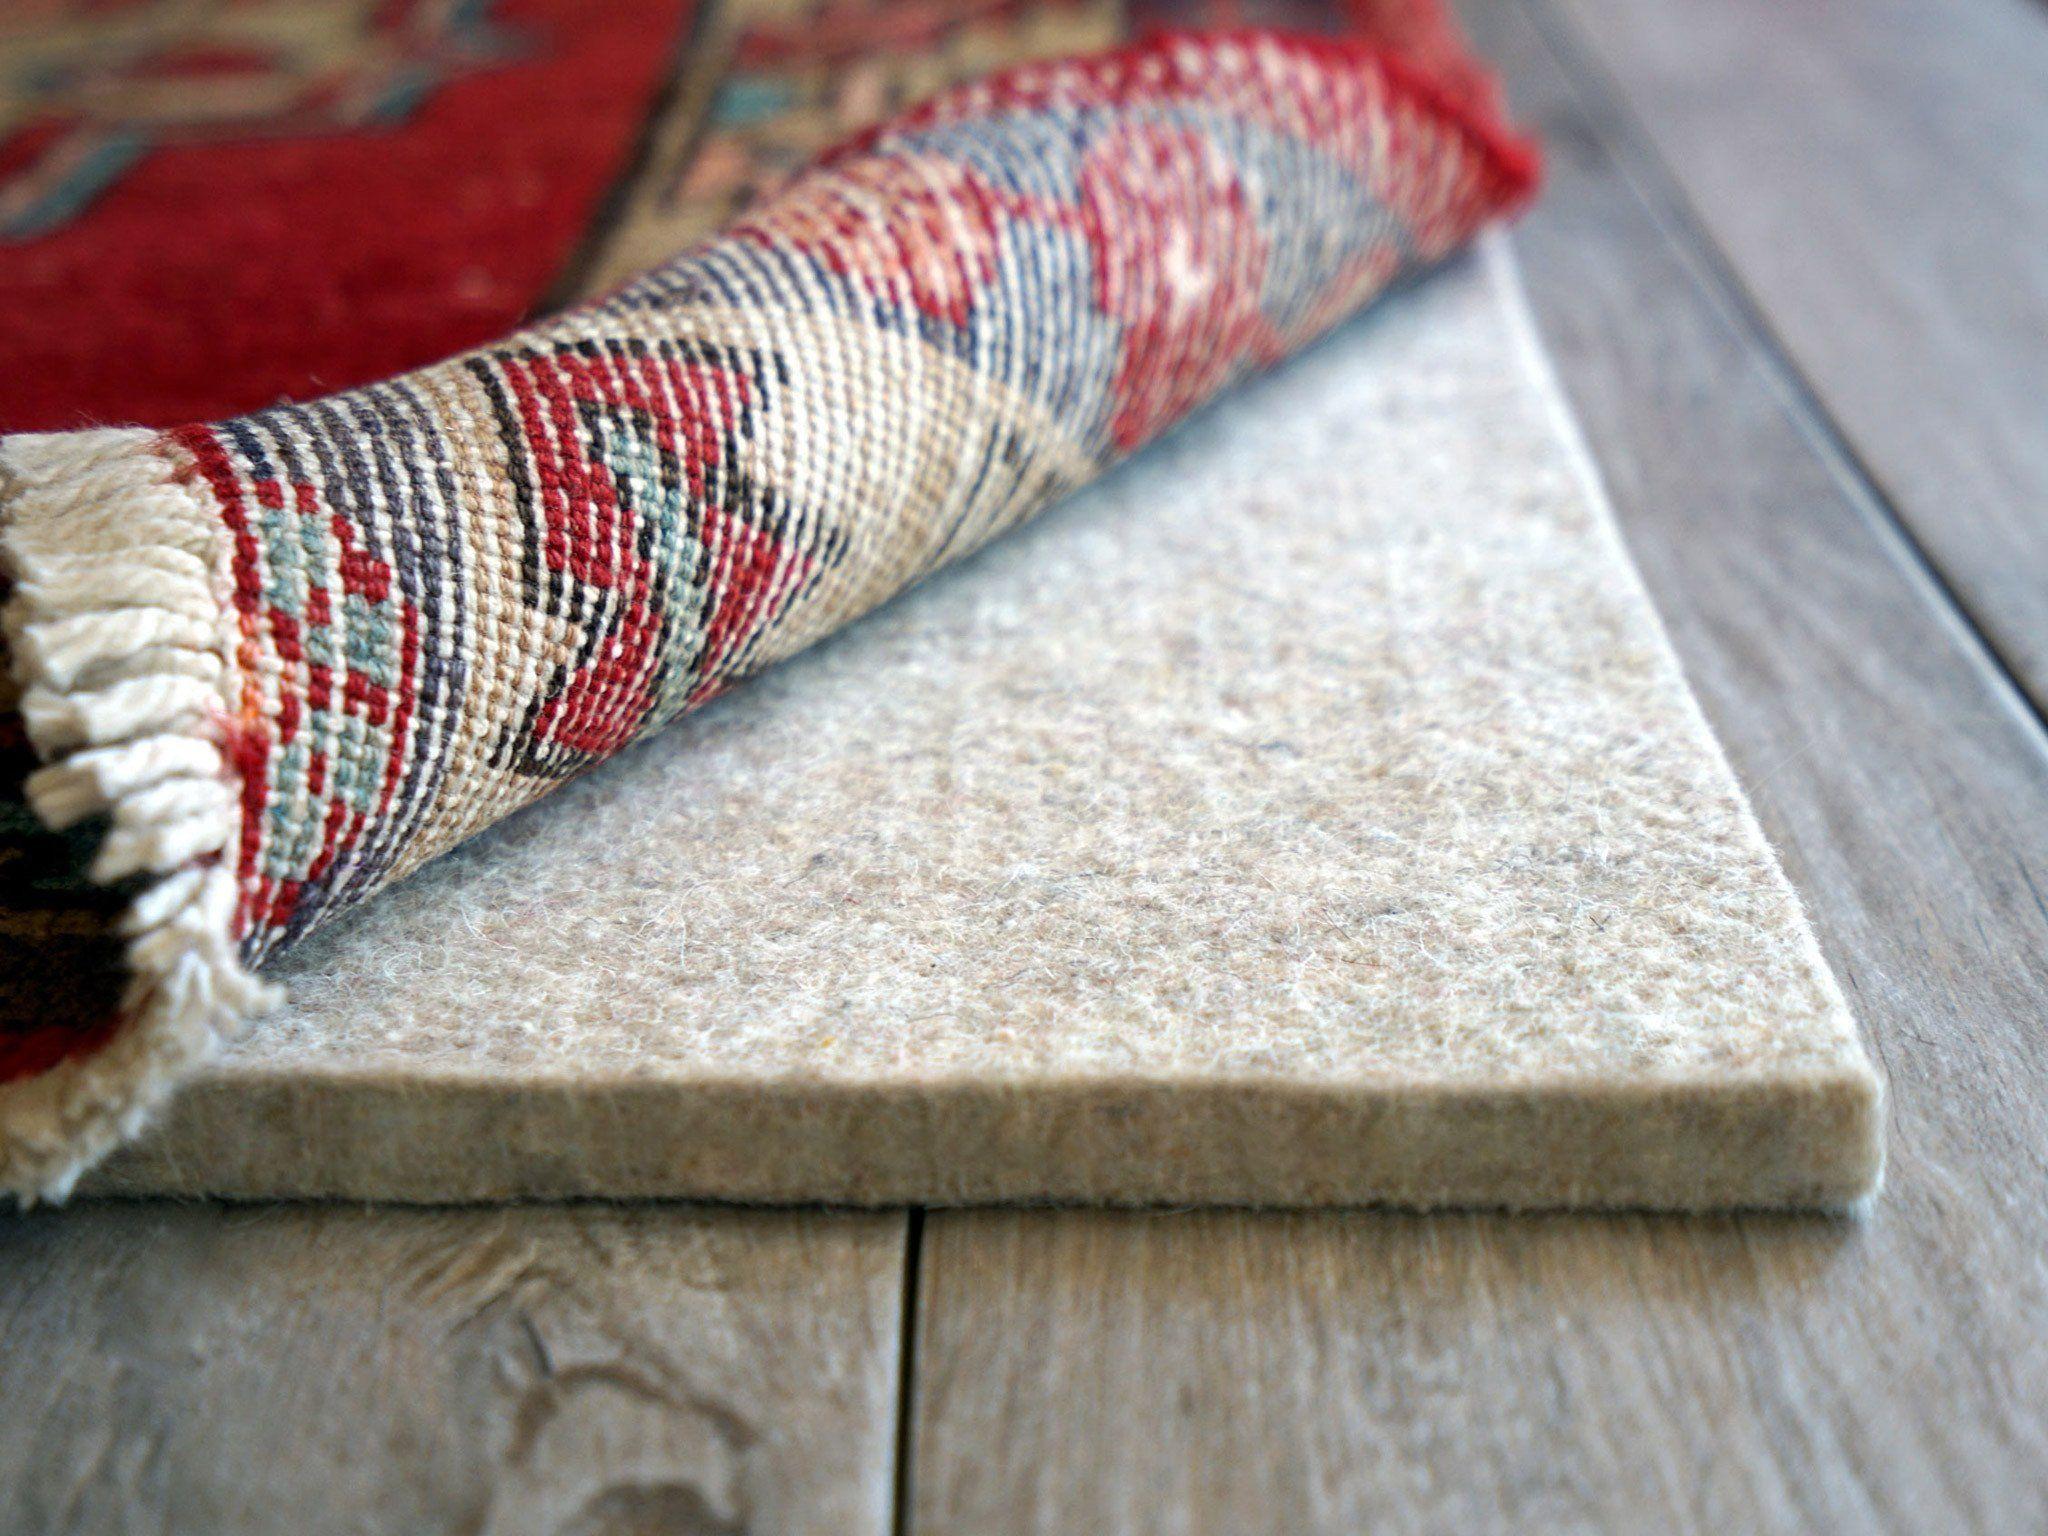 Insoles For Concrete Floors